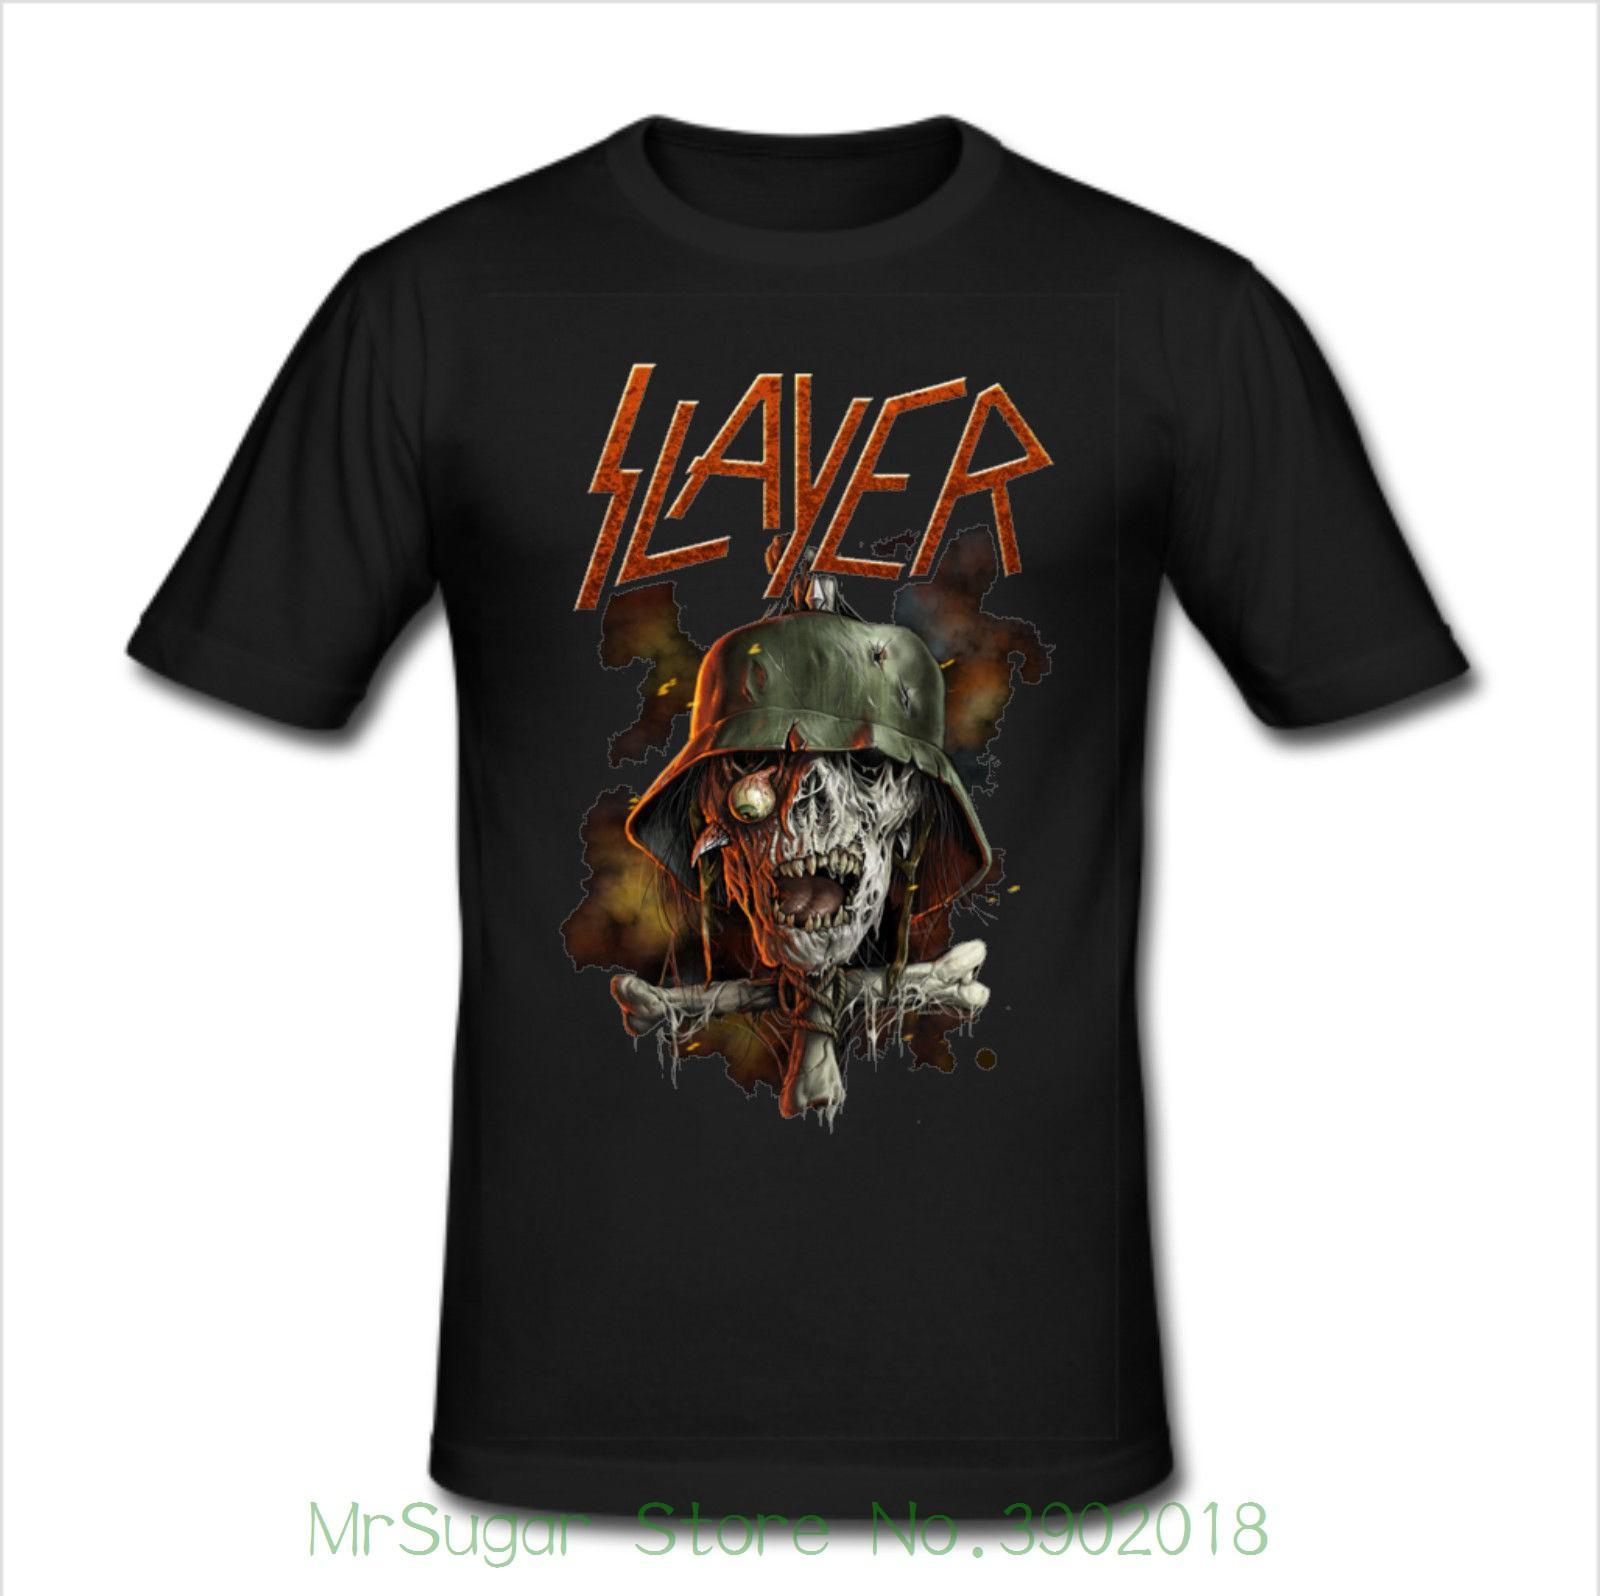 8ca9e880379d Men's Slim Fit T Shirt Size Xl - Thrash Metal Band Print T Shirt Fashion  Short Sleeve